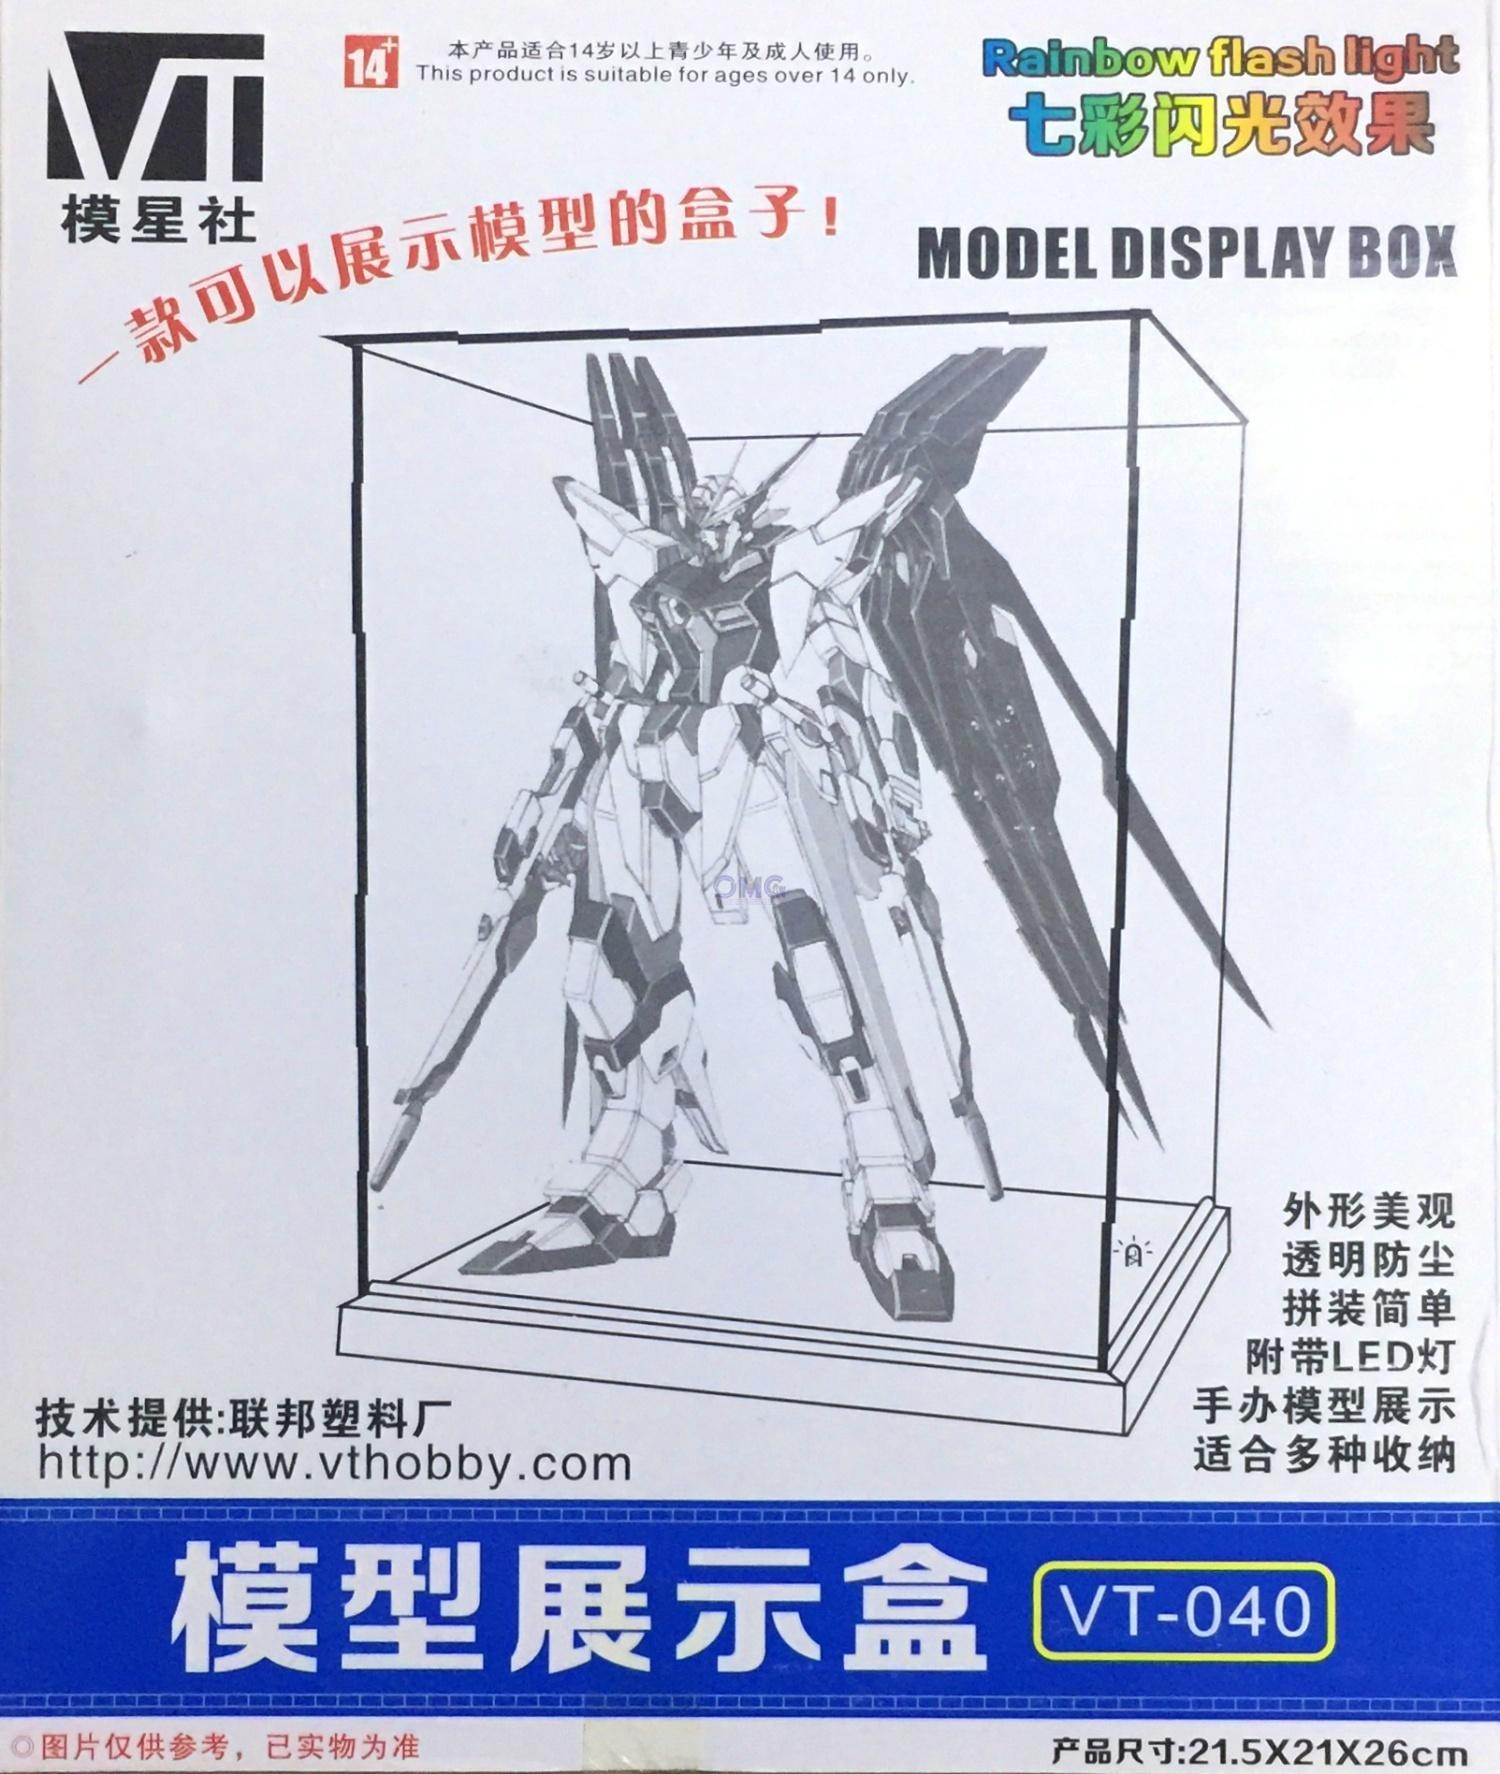 MG Display Box LED VT-040 1.0.jpg